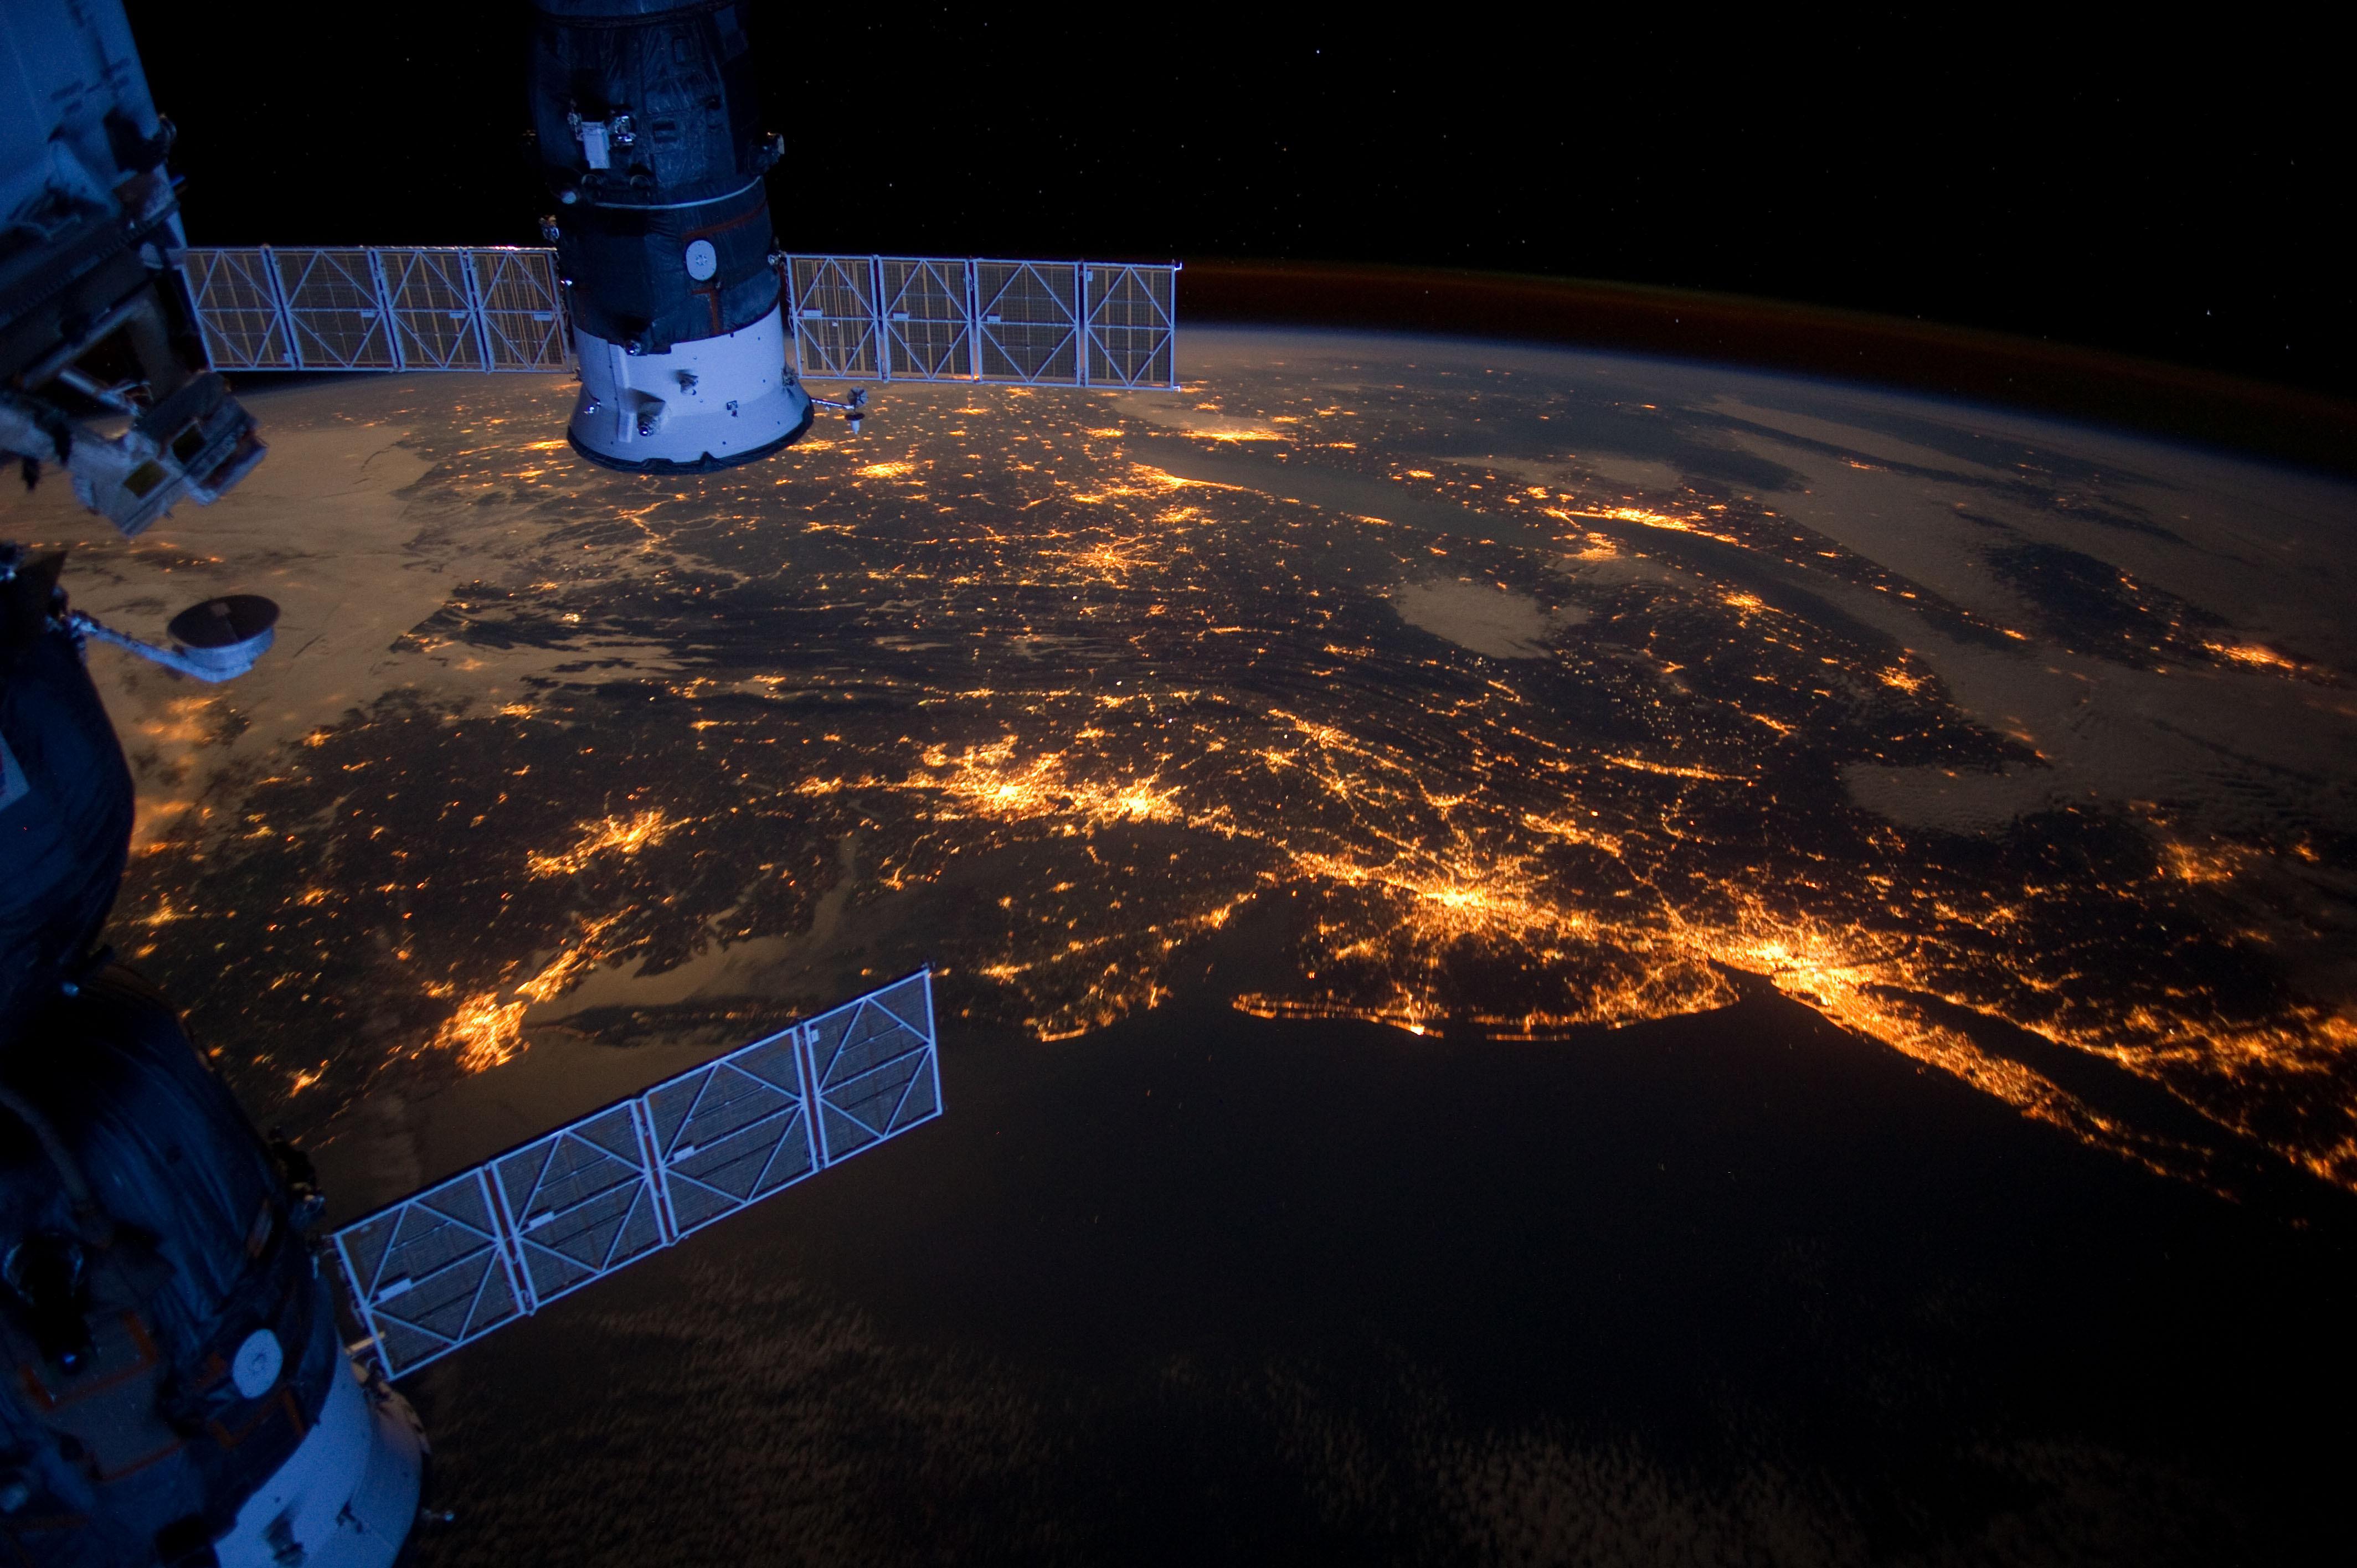 Earth From Space Hd Wallpaper Sf Wallpaper